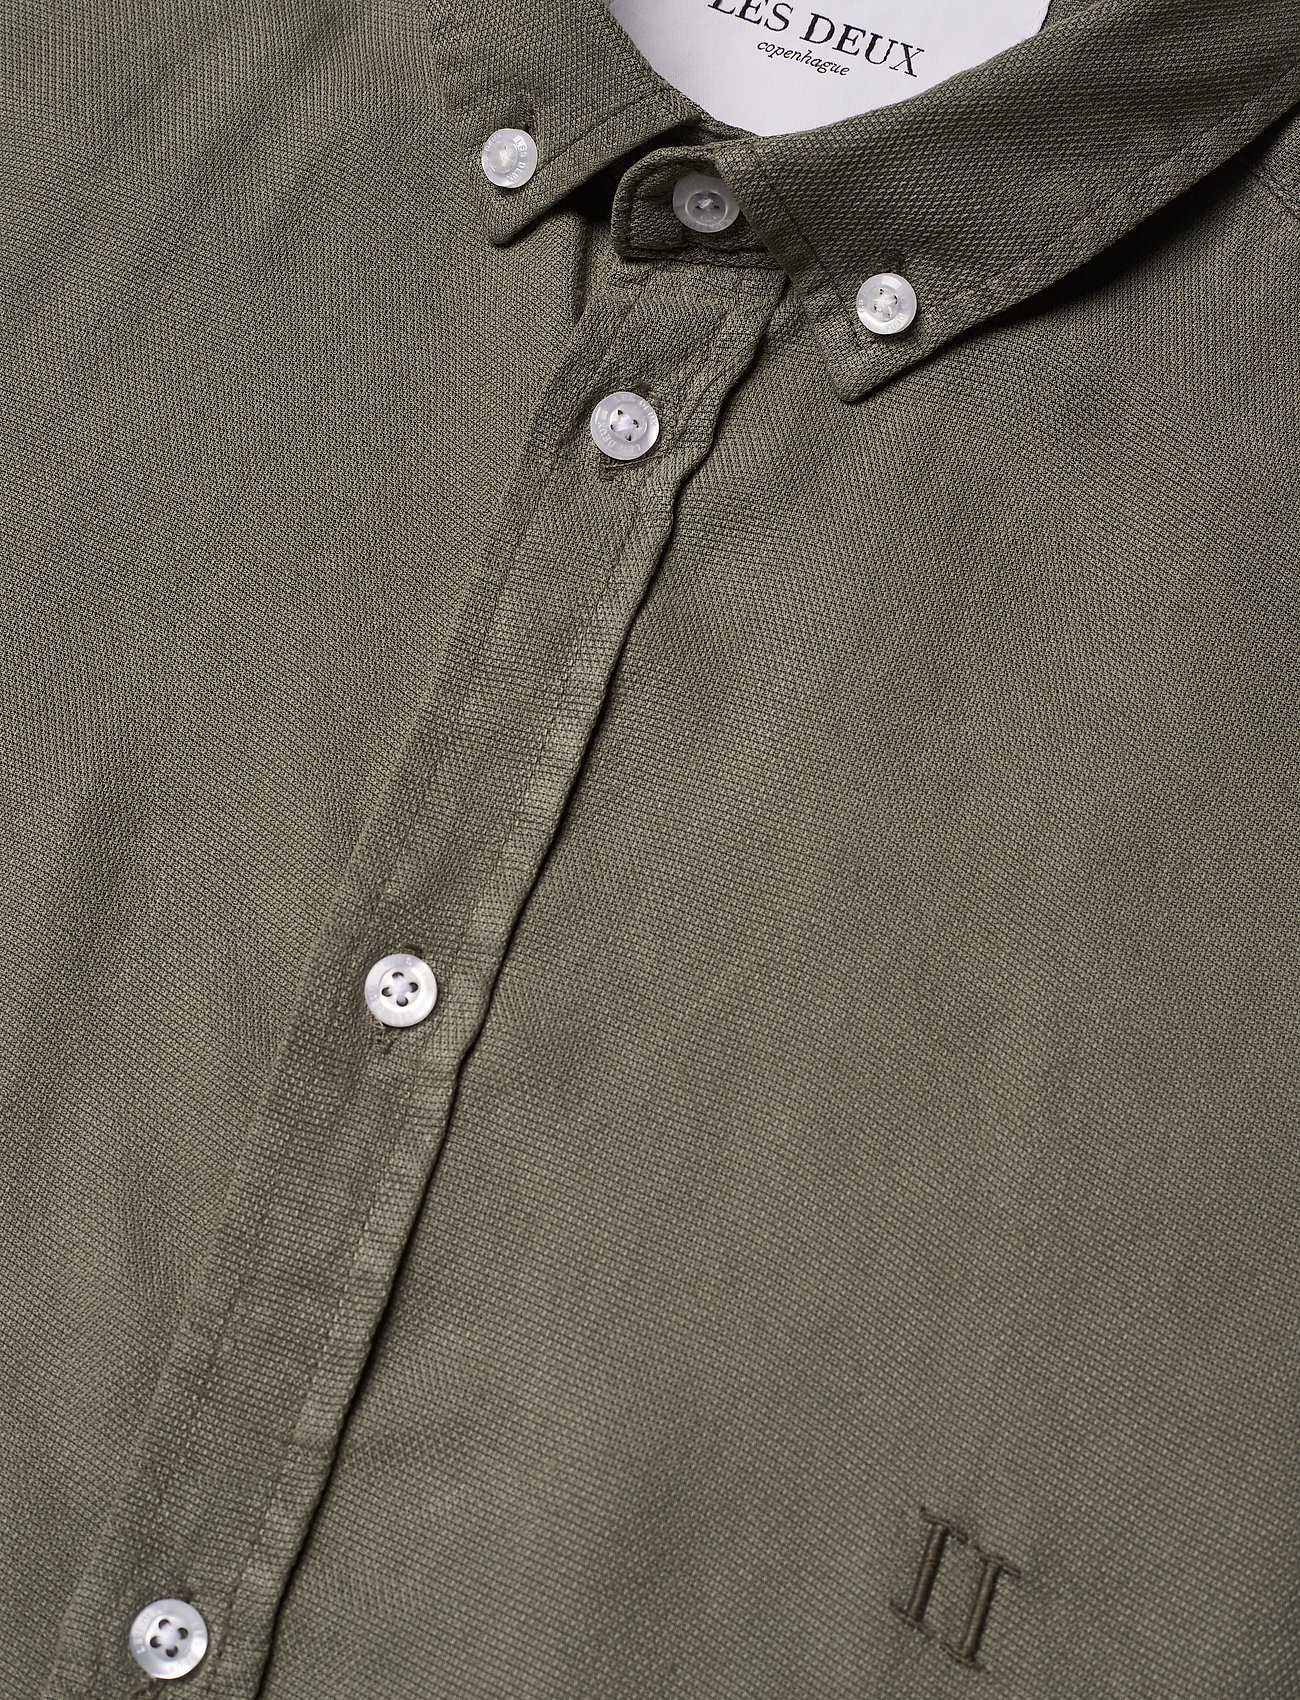 Les Deux - Harvey Tencel Dobby SS Shirt - chemises de lin - lichen green - 3